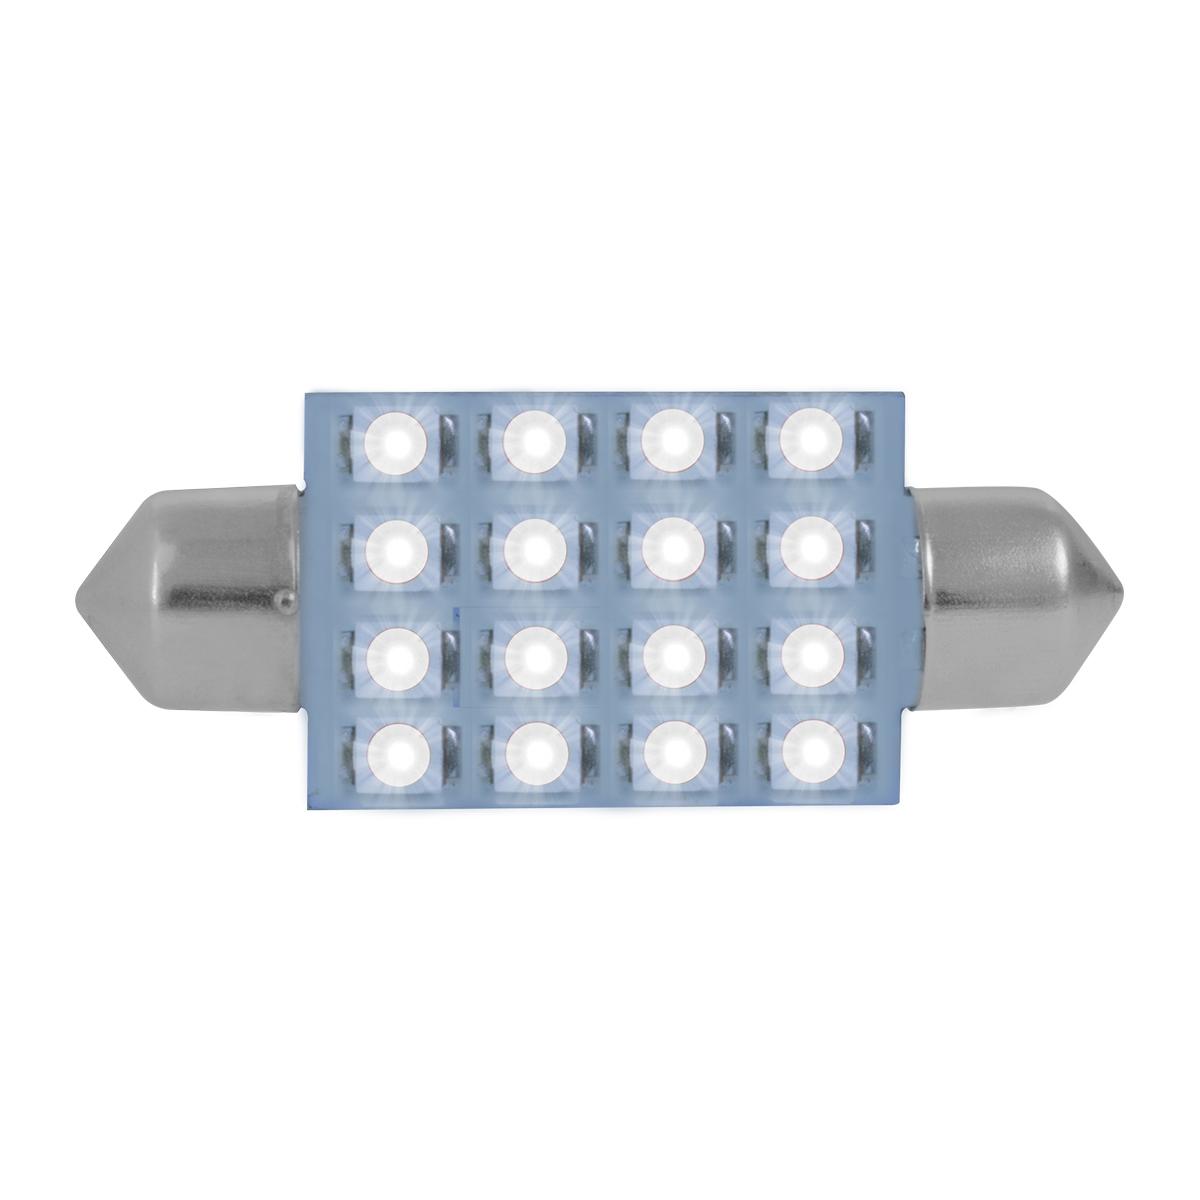 76104 White 211-2 Dome Type 16 LED Light Bulb